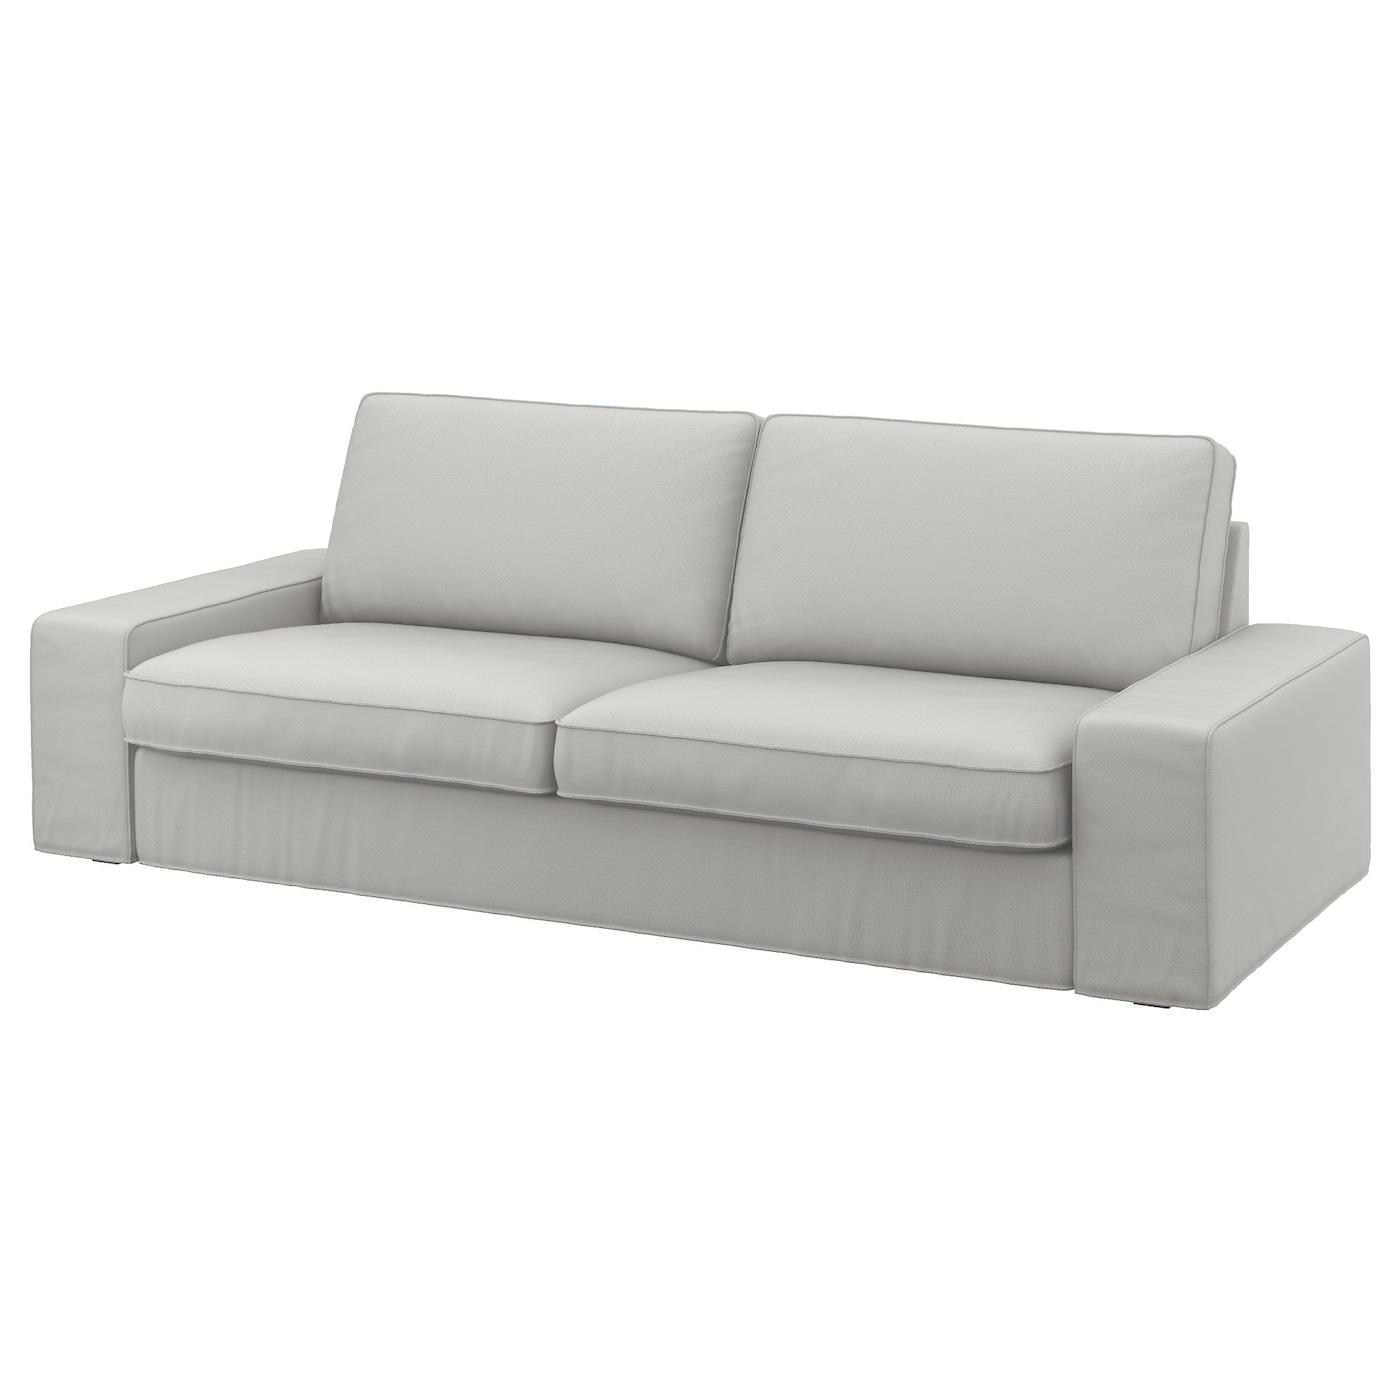 Kivik Ramna Light Grey Cover Three Seat Sofa Ikea